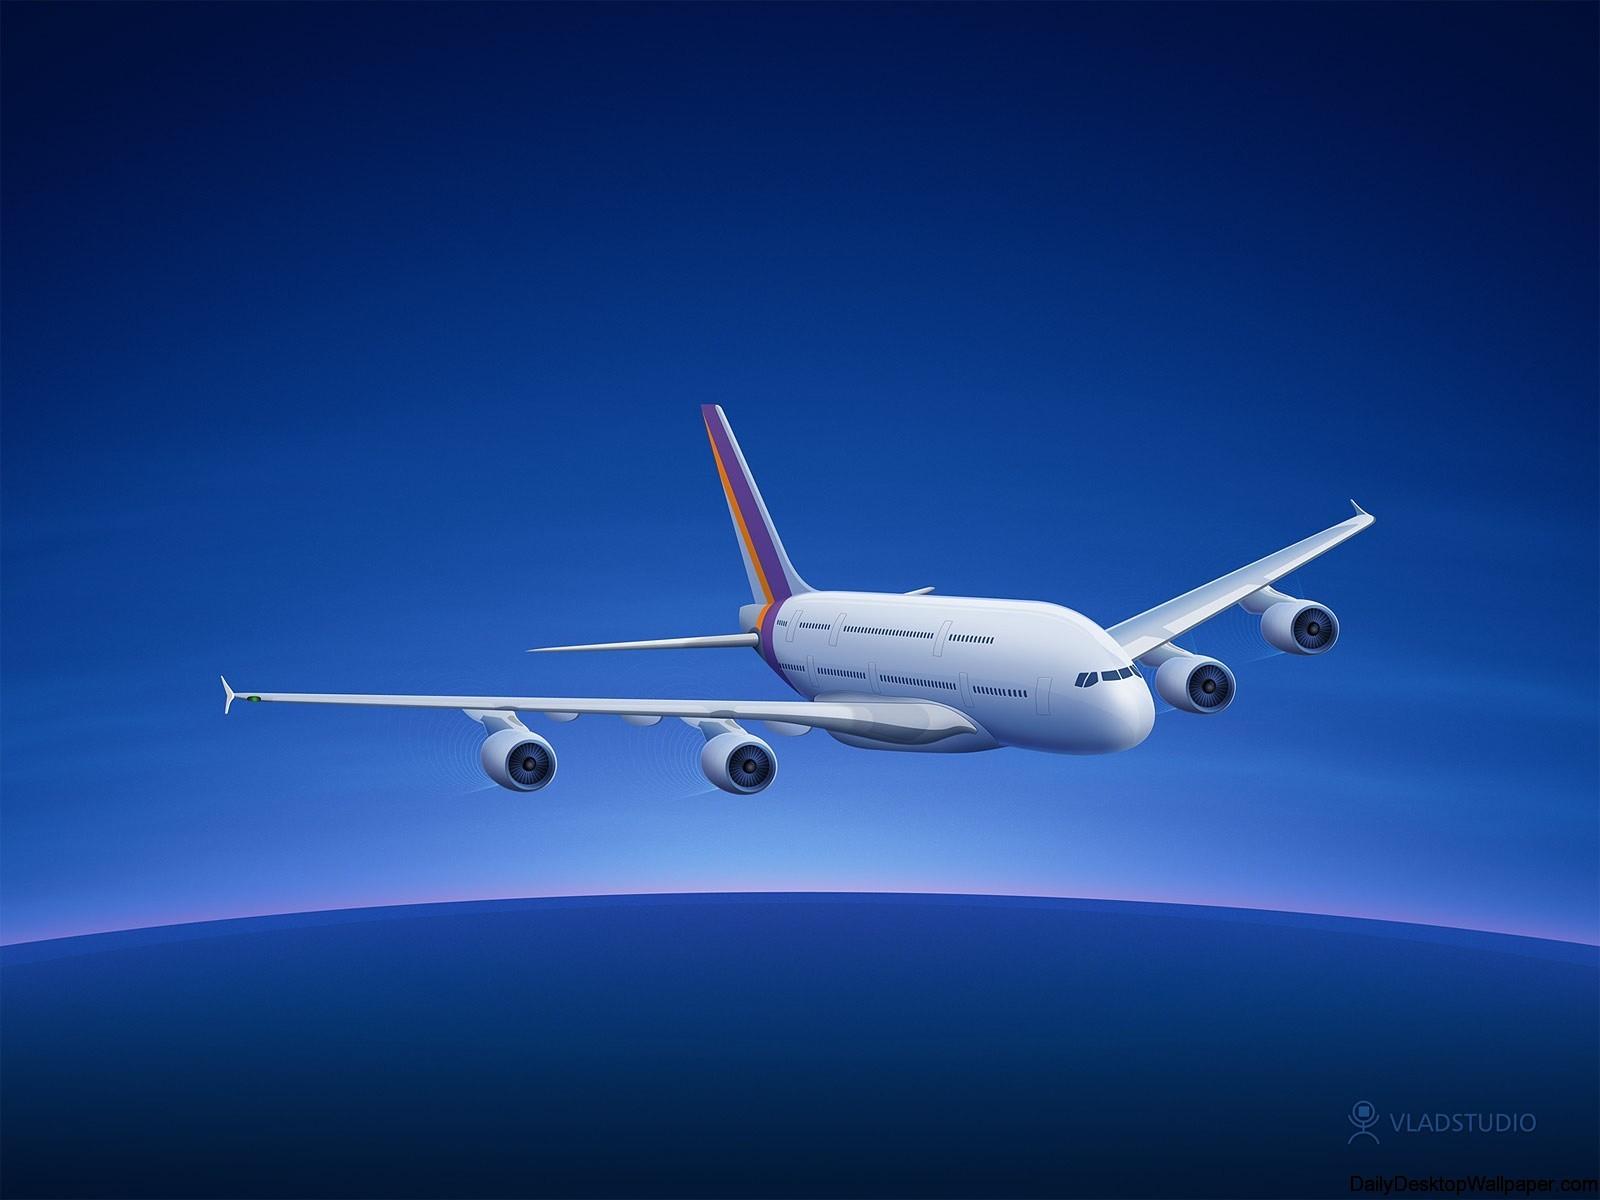 Airbus A380 wallpaper